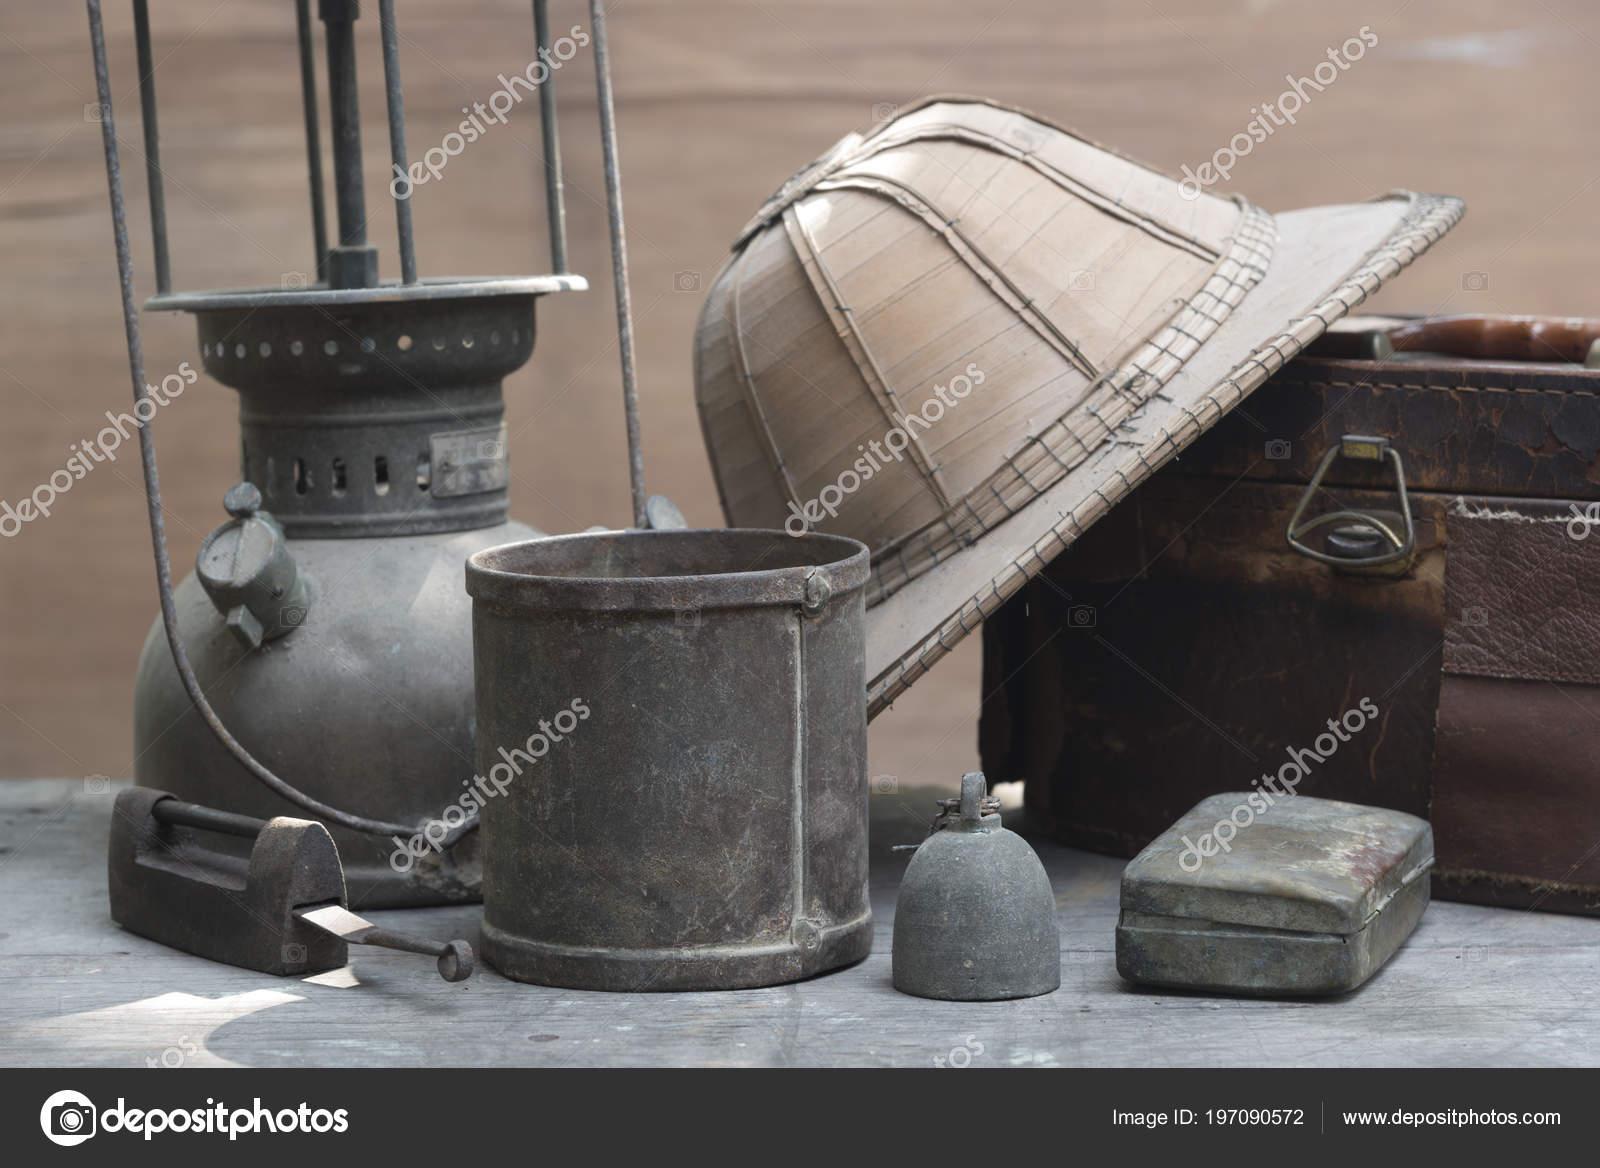 antique kitchen table black faucets pull out spray 旧古董的重量测量和厨房货物称重木制的桌子上 图库照片 c chokniti 197090572